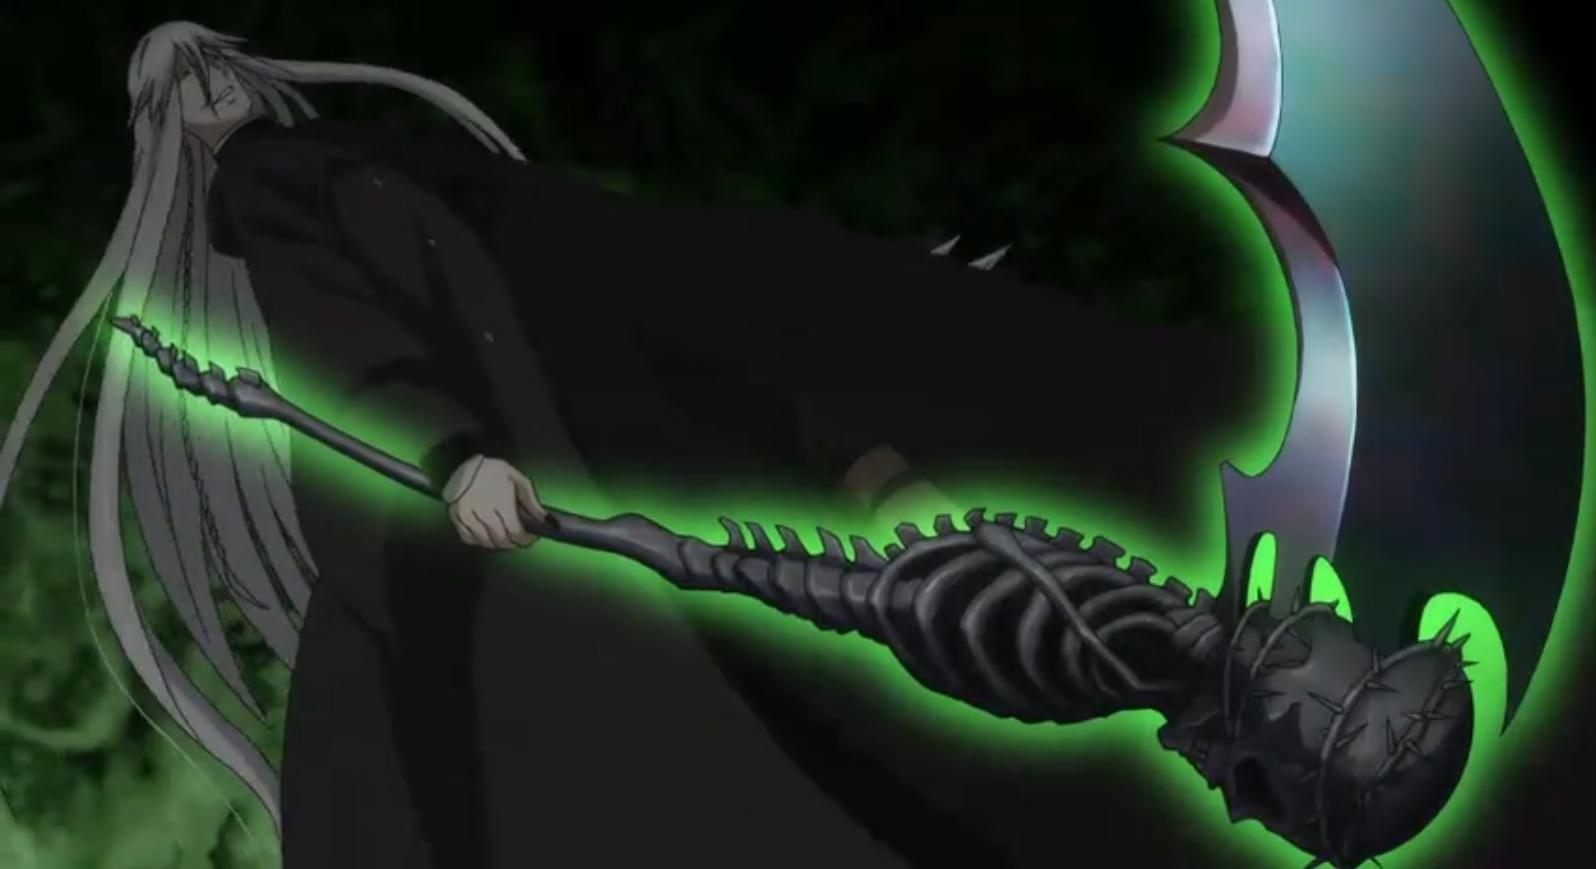 Undertakers death scythe by sasunaru121-d4a51v6